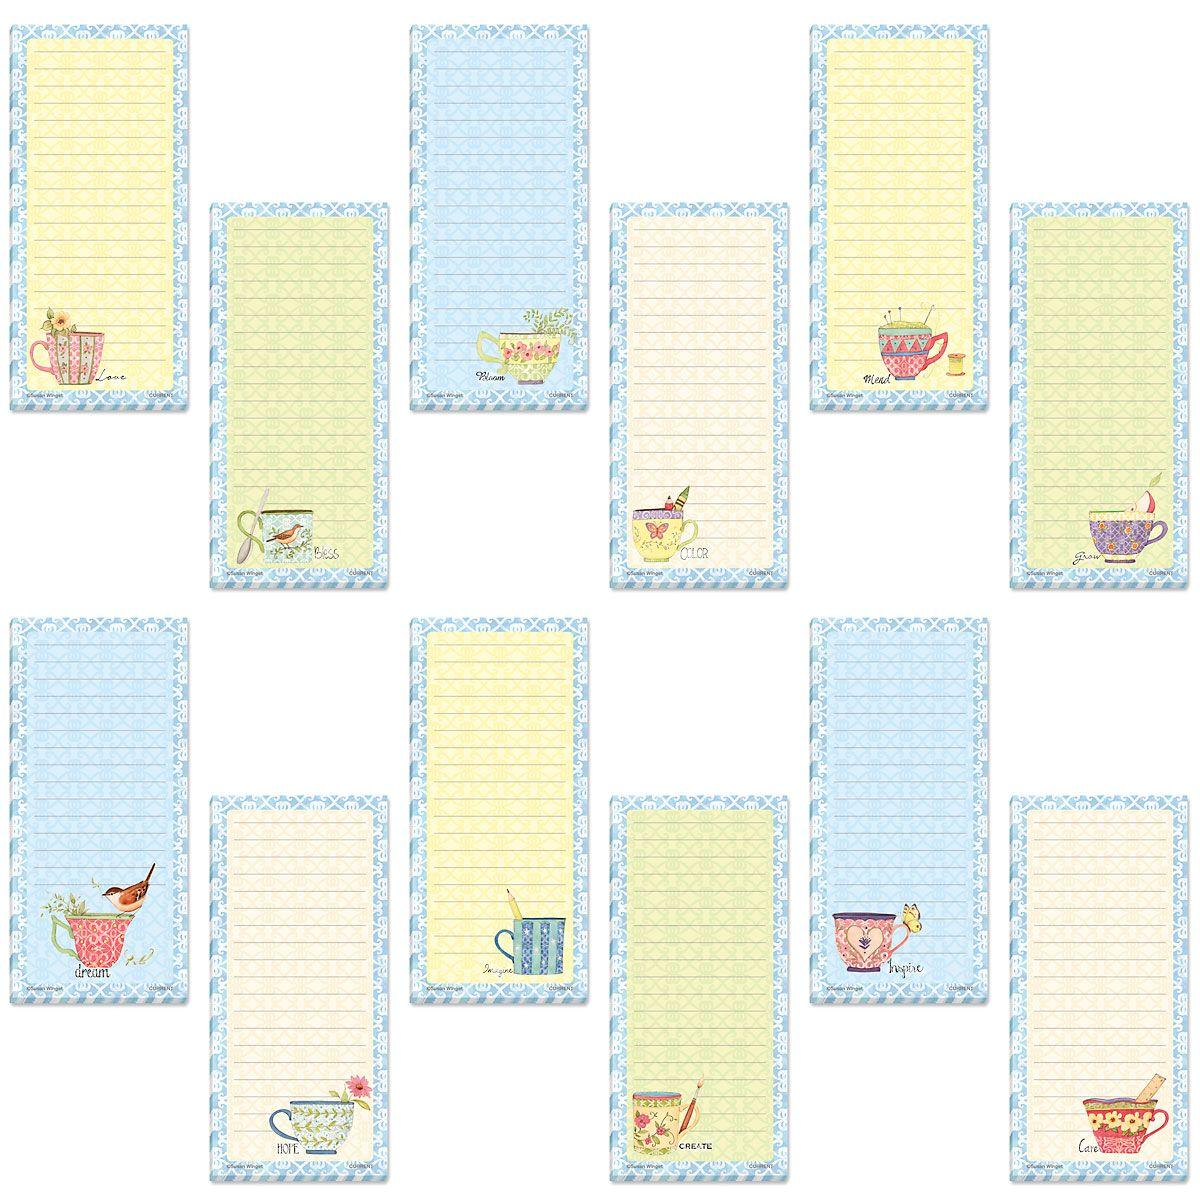 Teacups Shopping List Pads